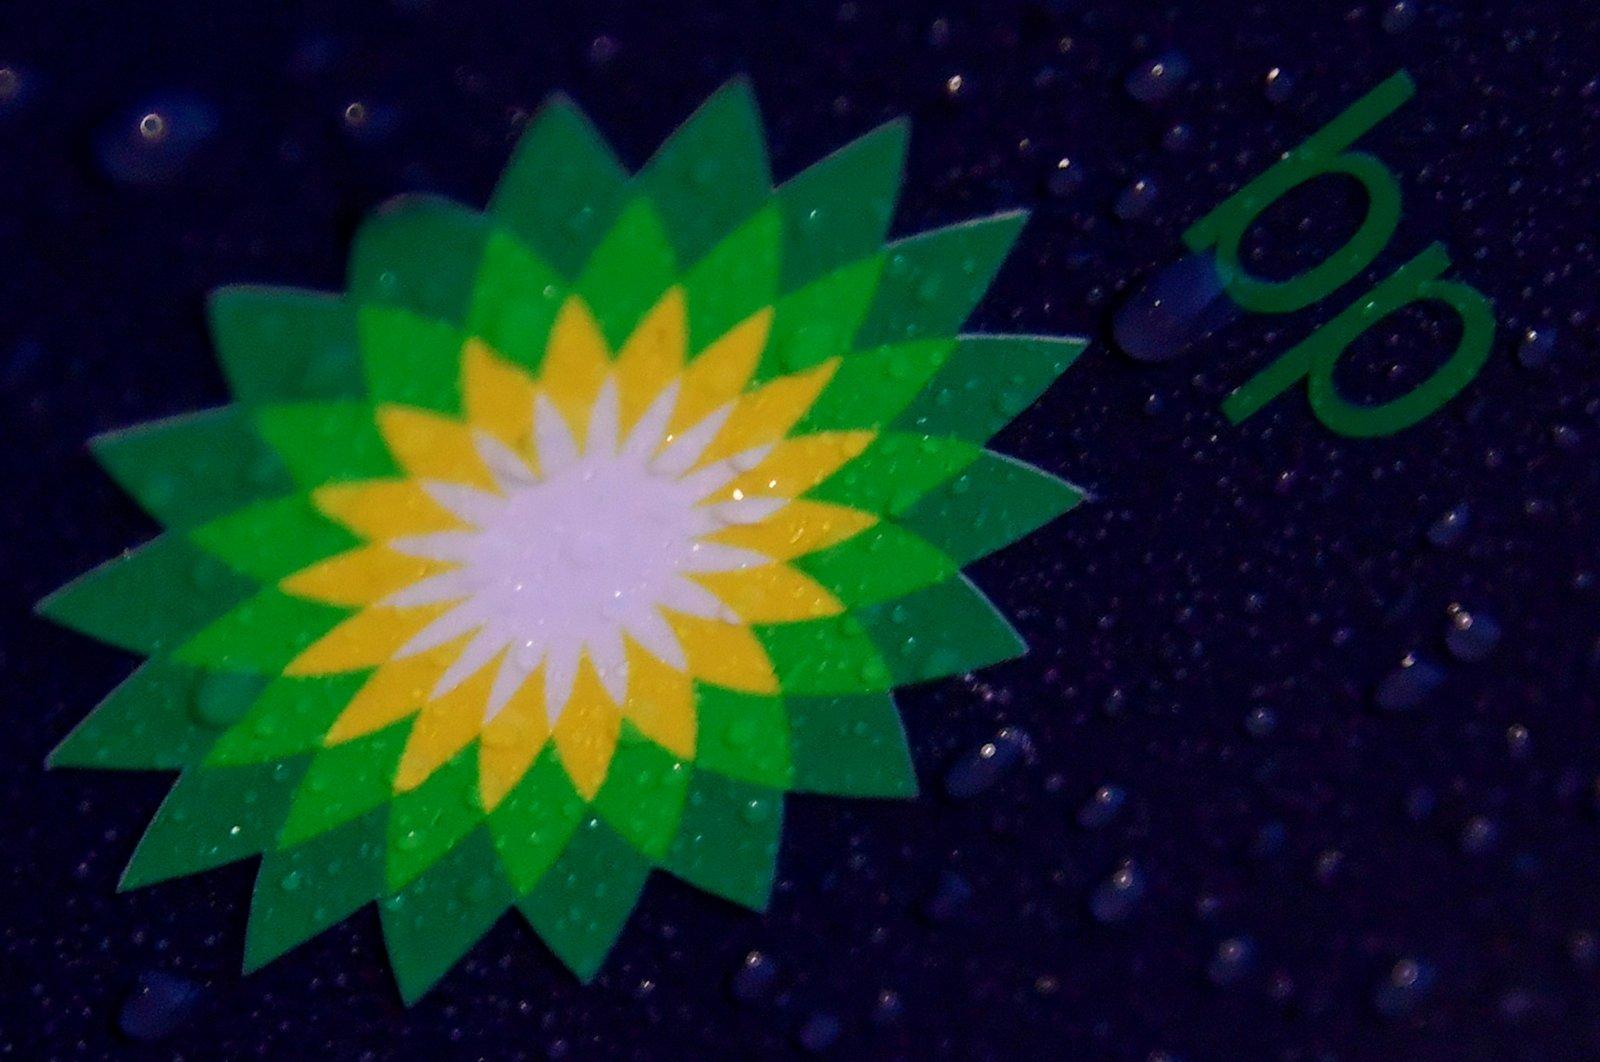 Energy giant BP focuses on renewable investments in Turkey